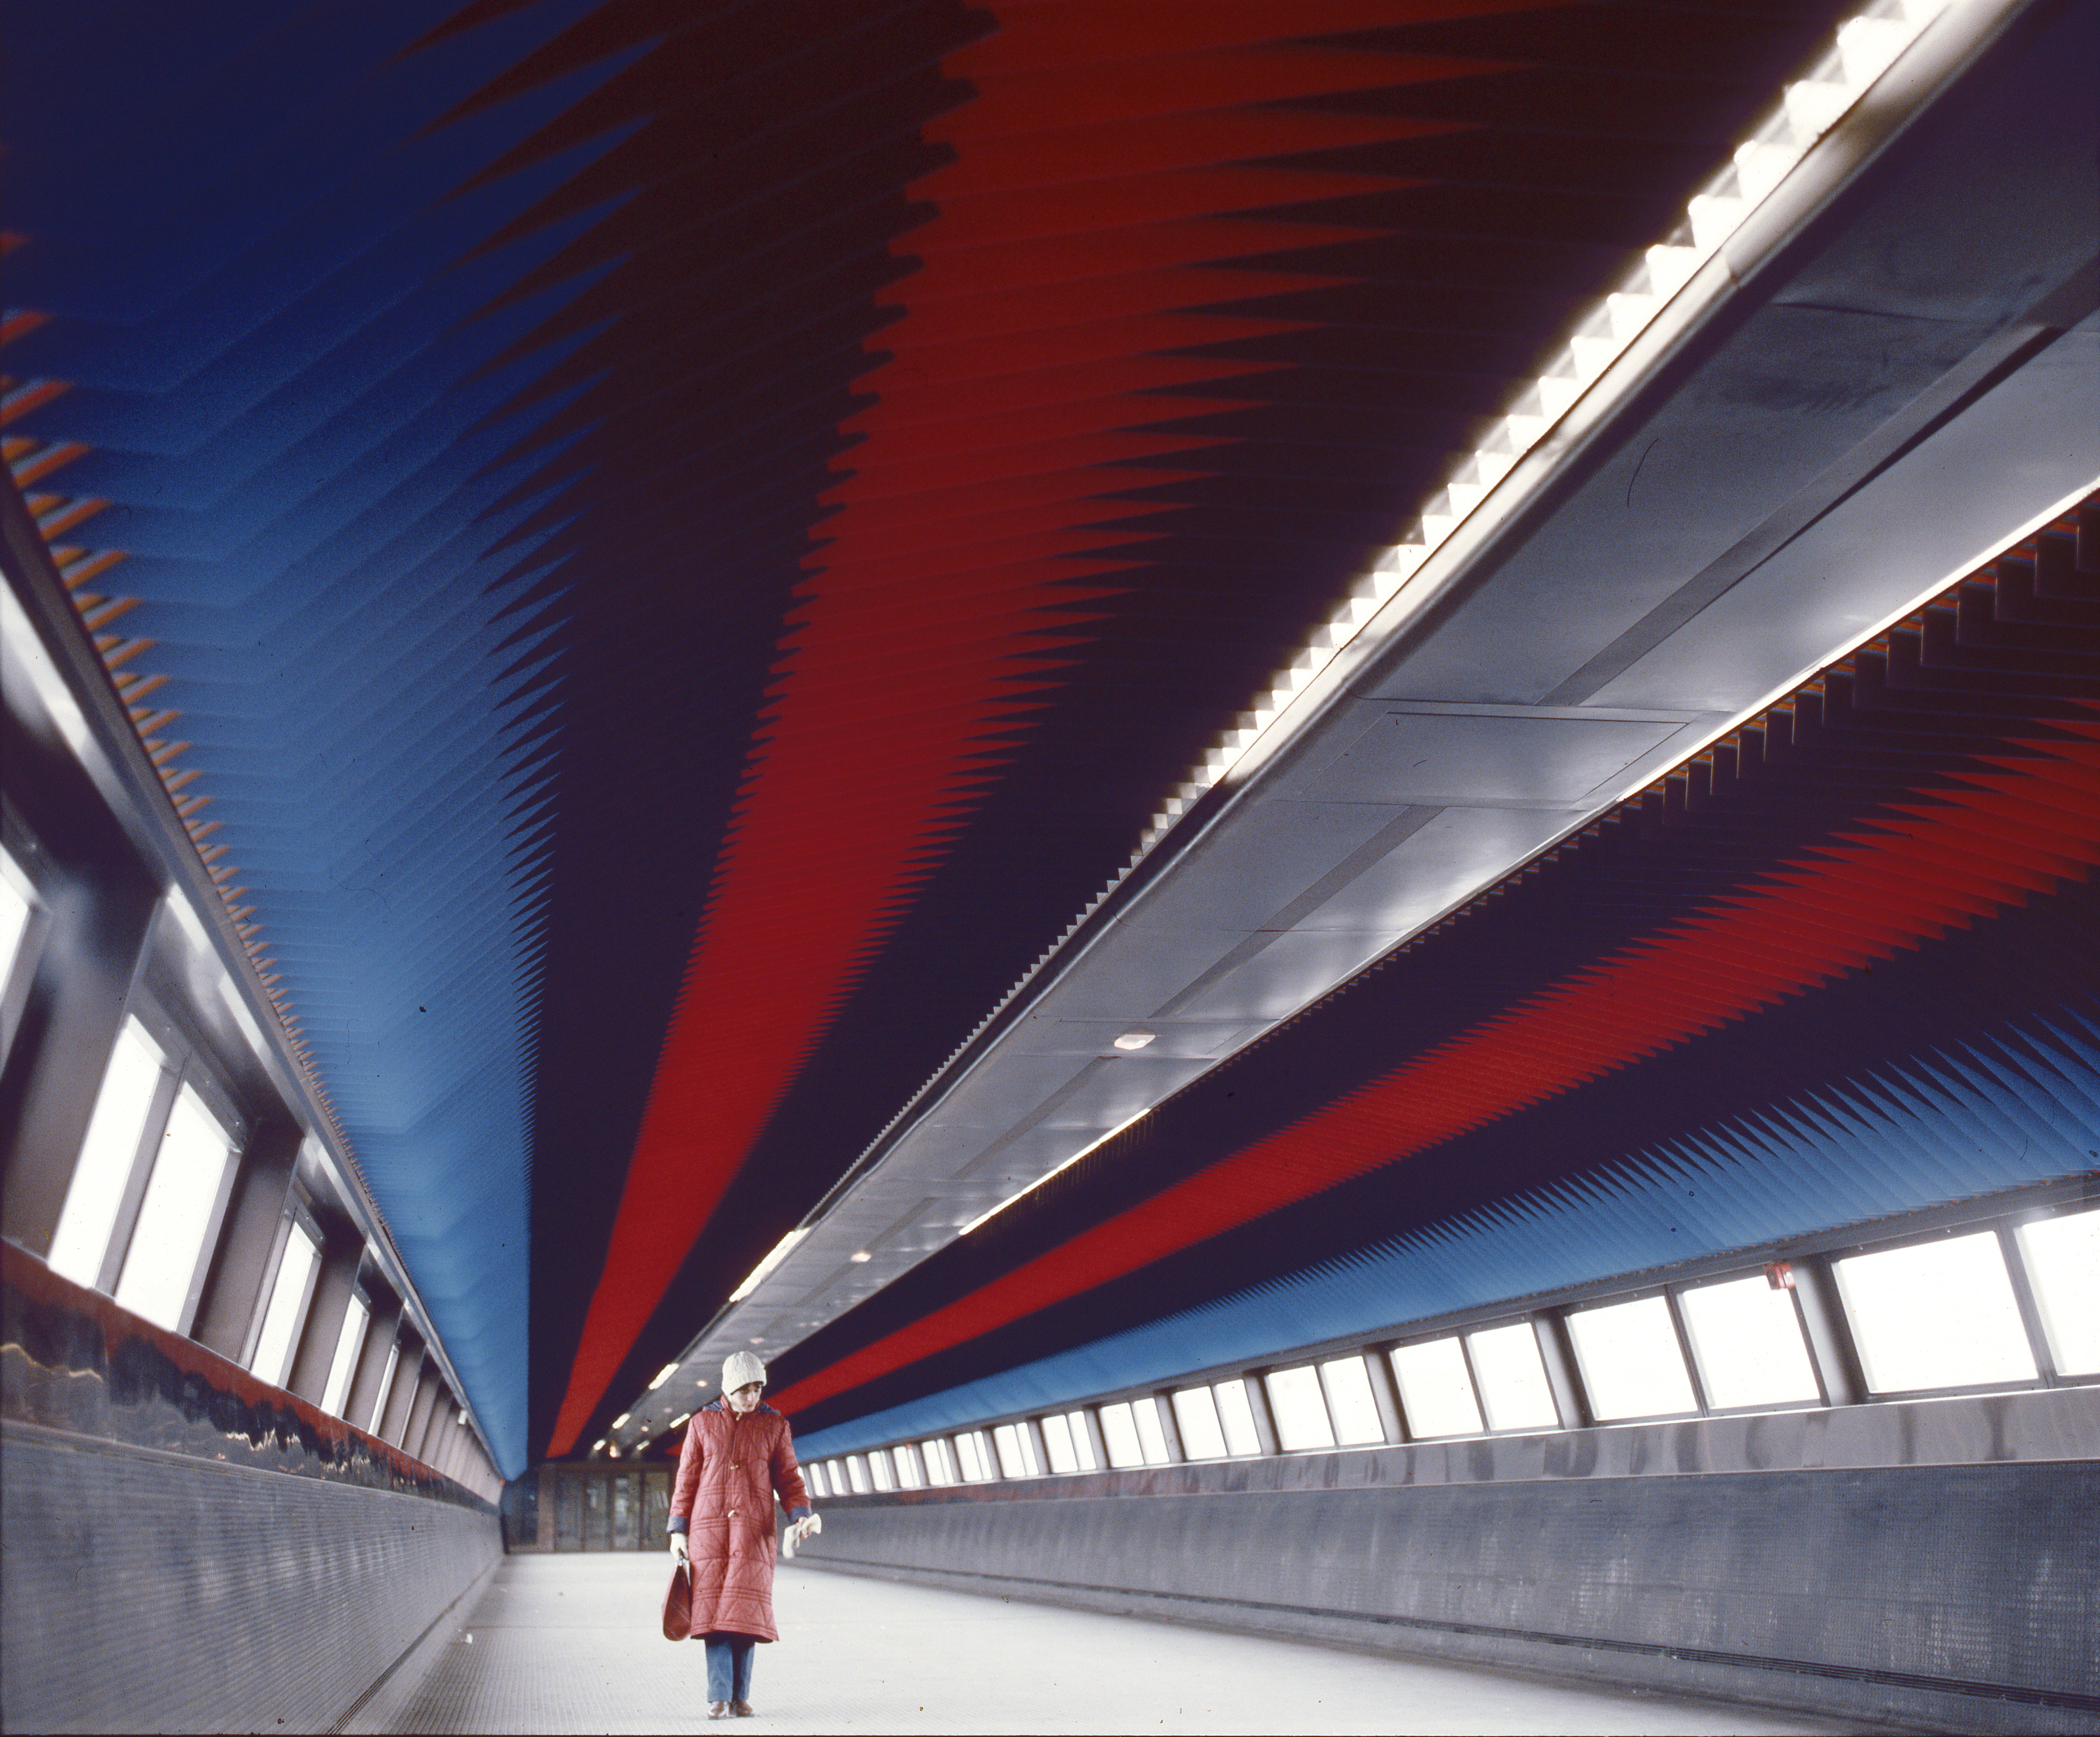 1980_Arch_Plafond_Passarelle_St Quentin_002